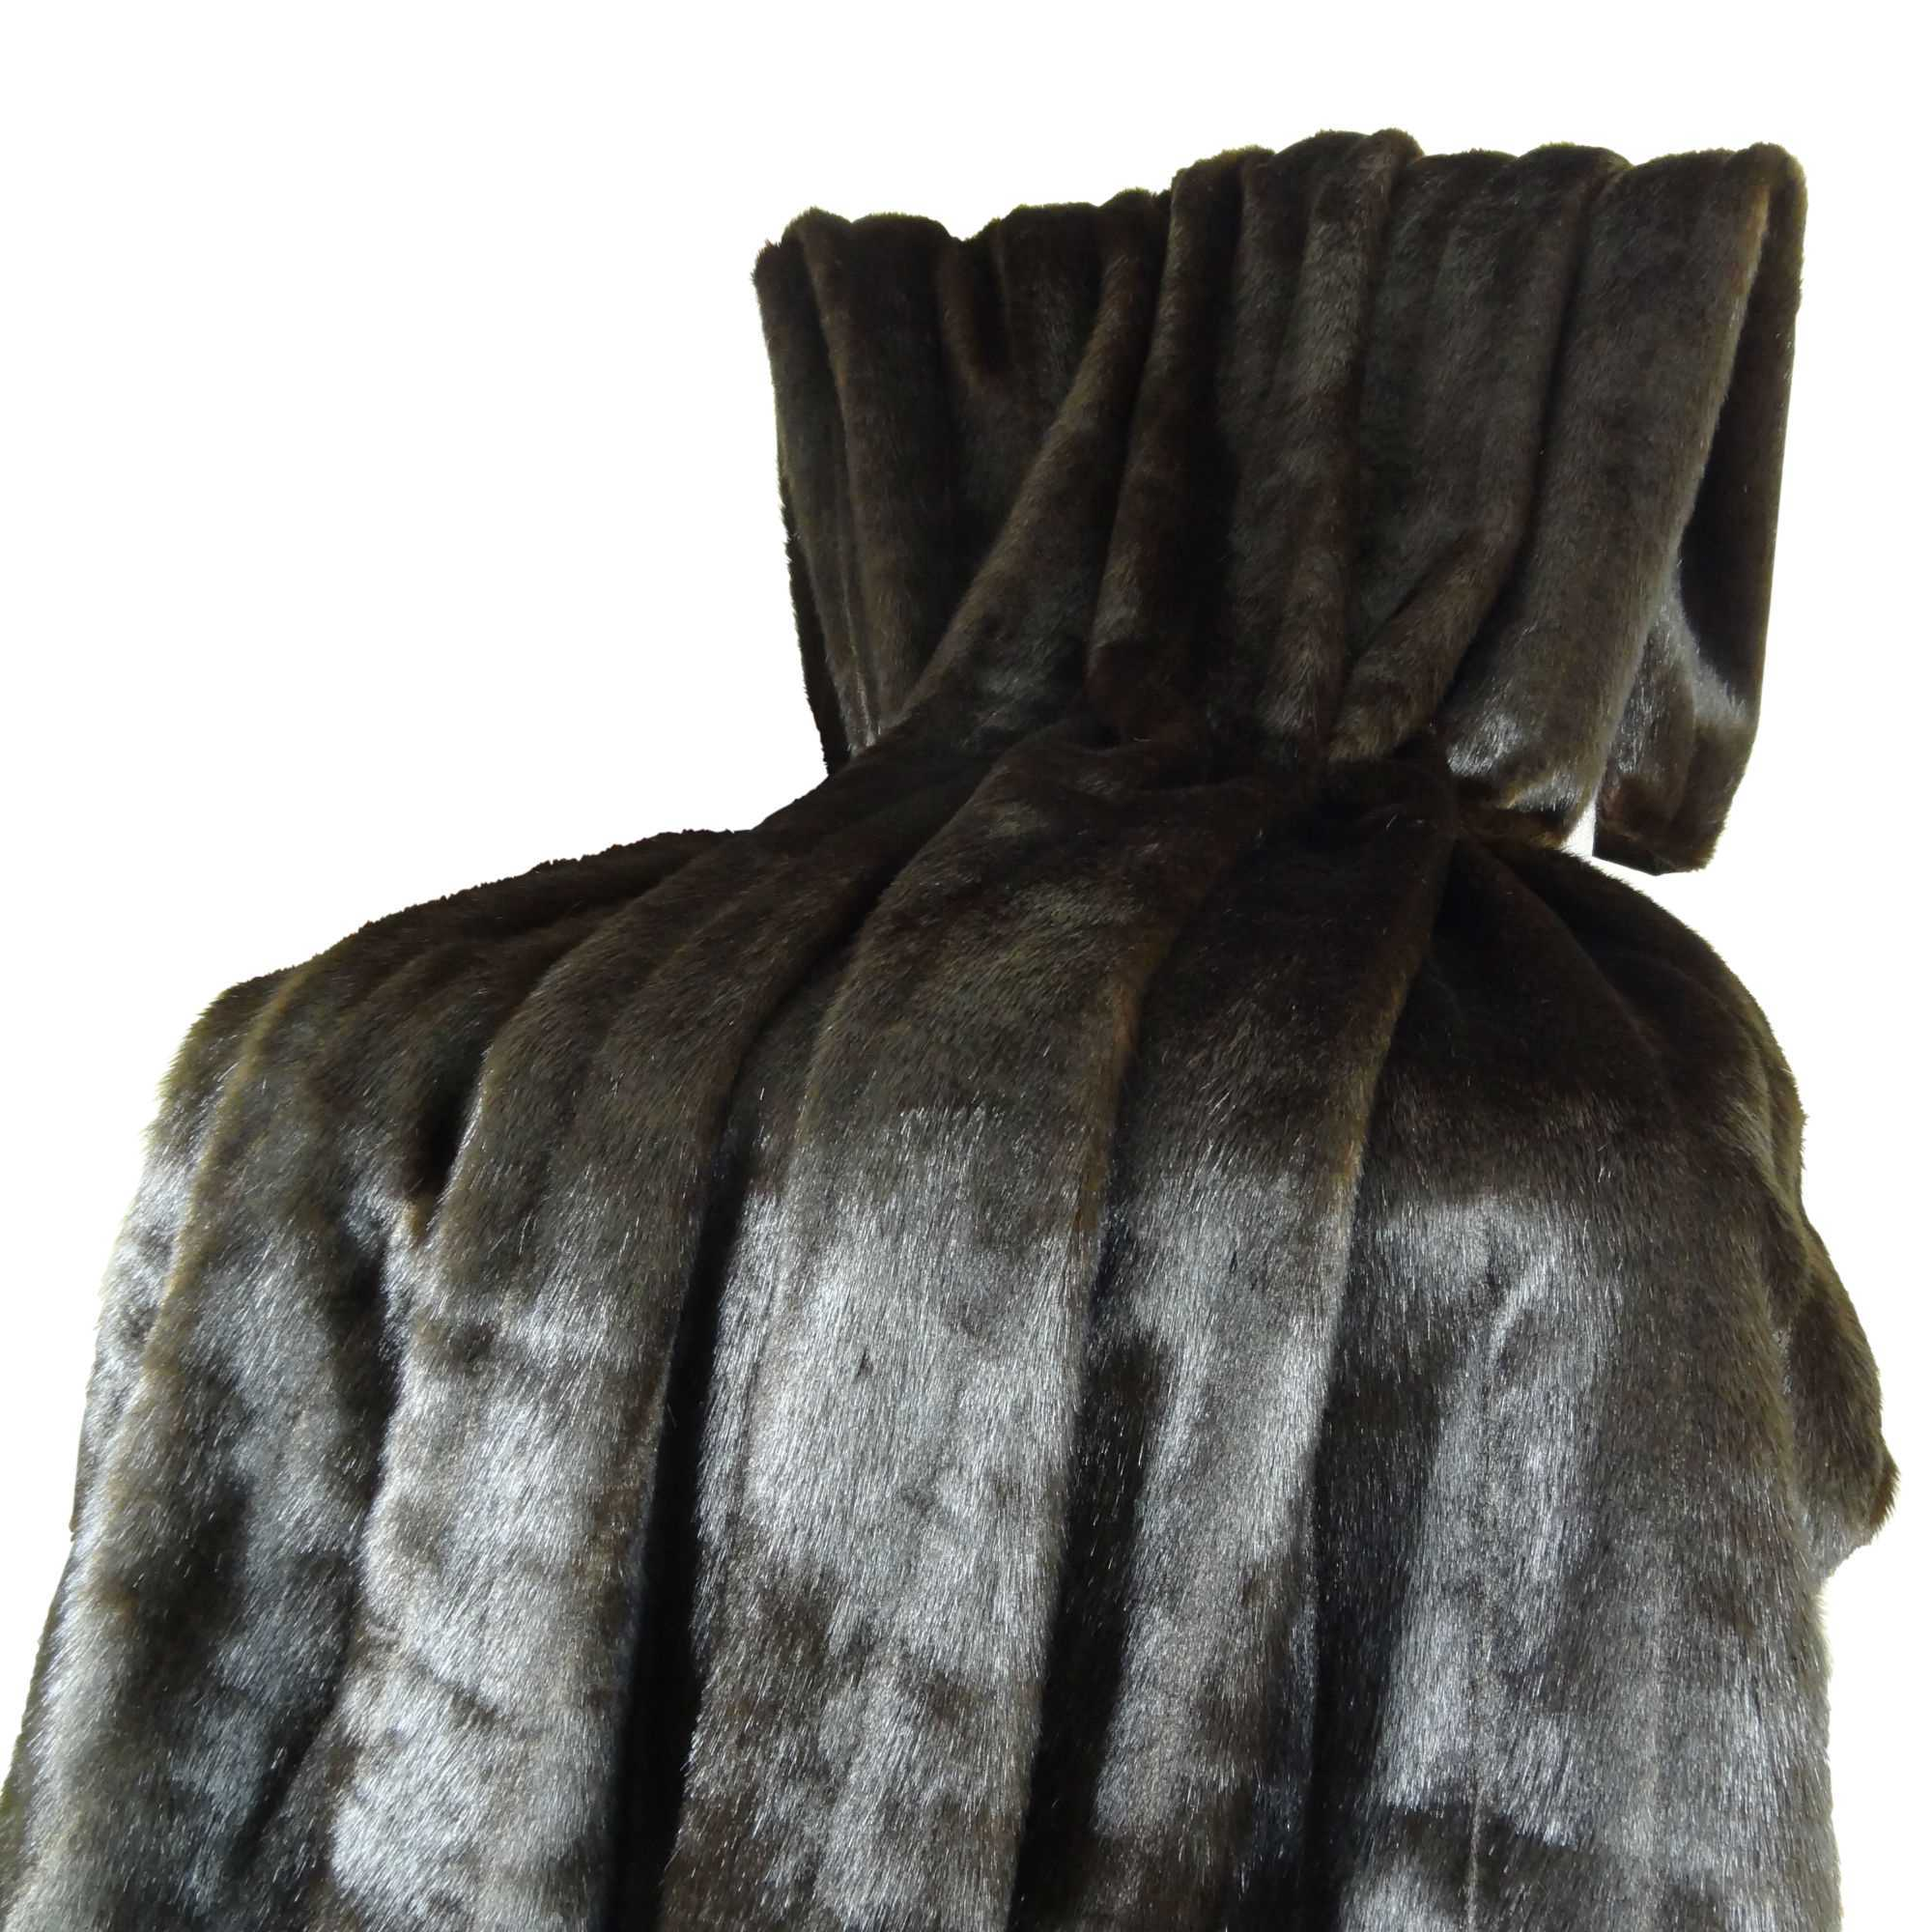 Tip Dyed Brown-Mink Handmade Throw